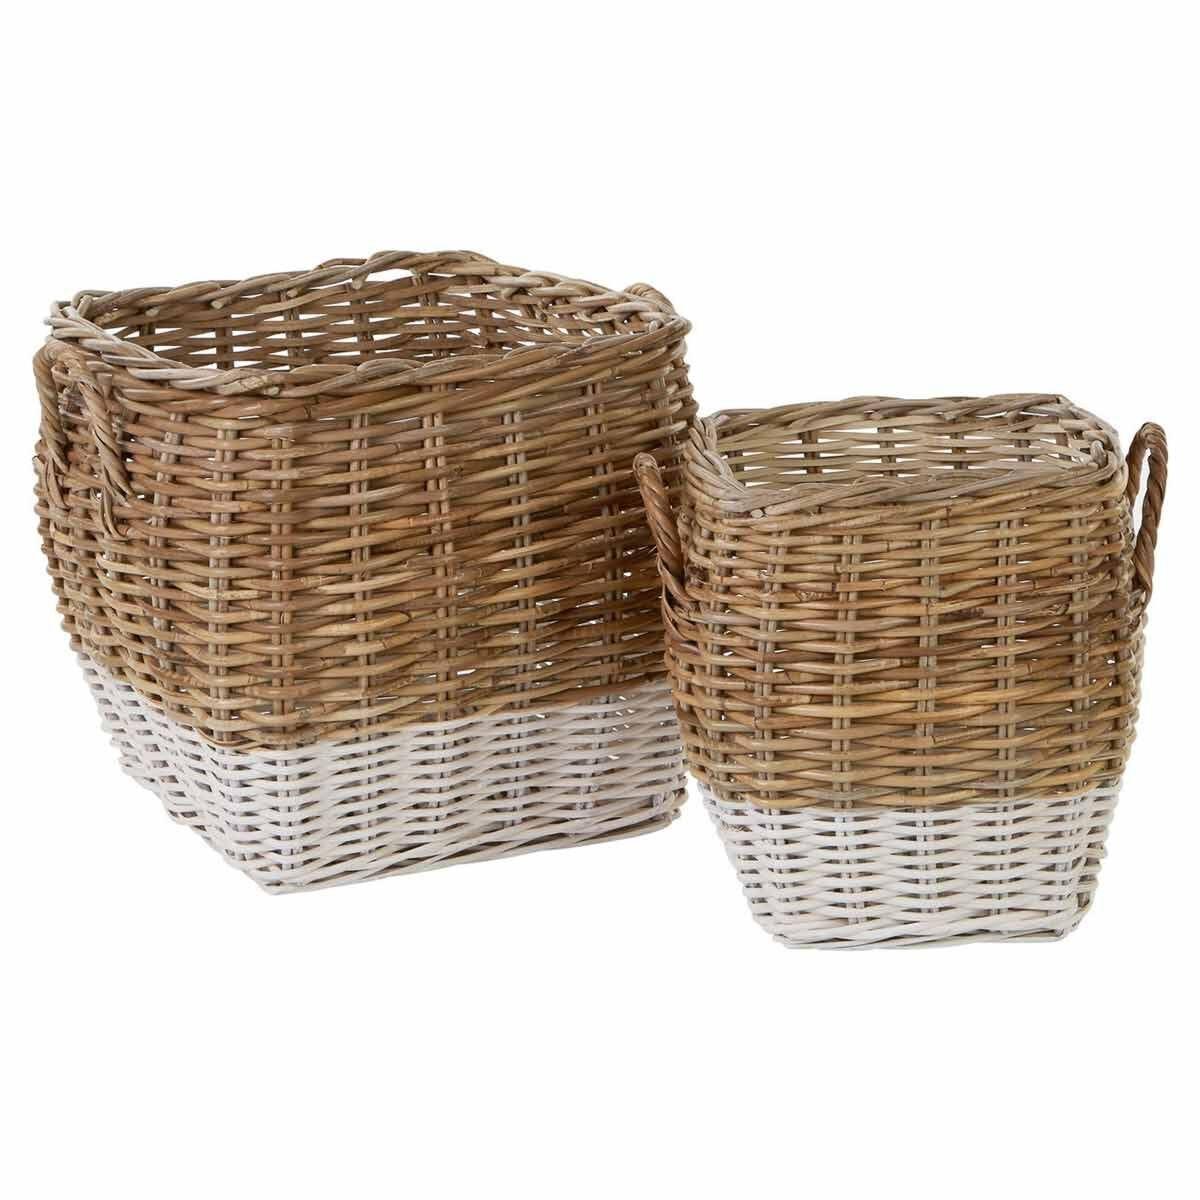 Hampstead Square Storage Baskets Set of 2